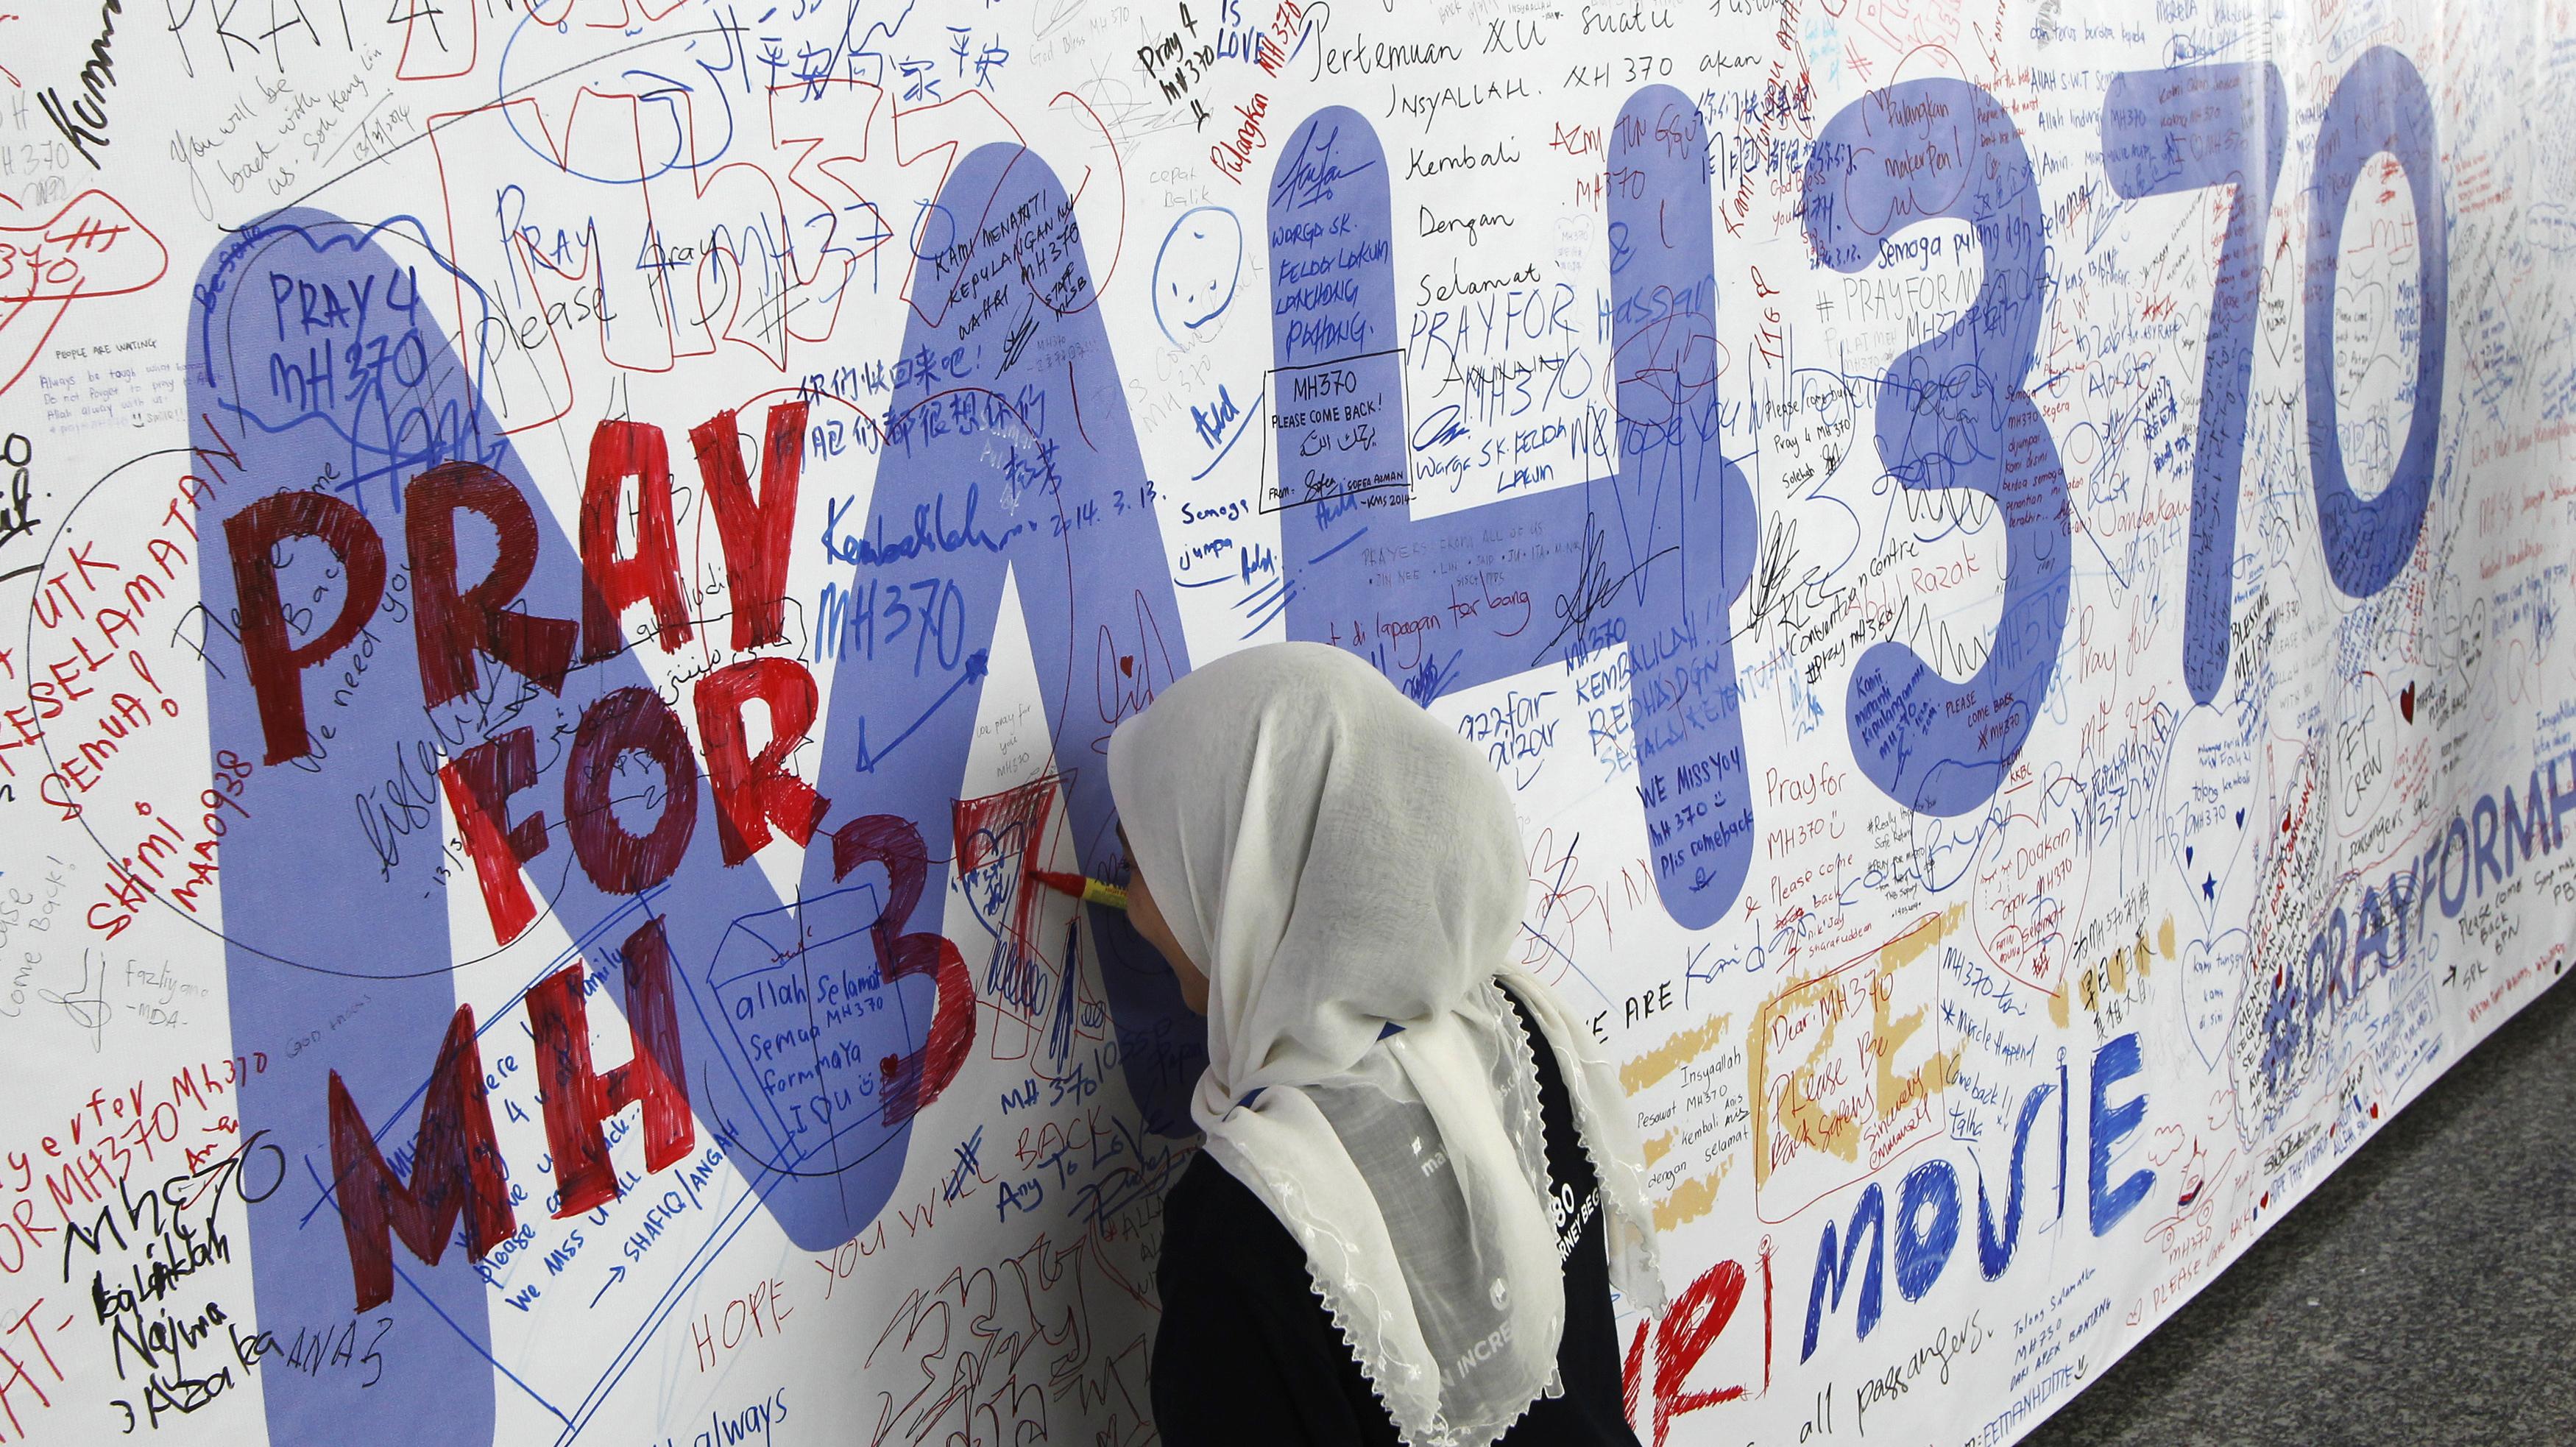 Missing Jet Reportedly Kept Sending Signals For 5 1/2 Hours